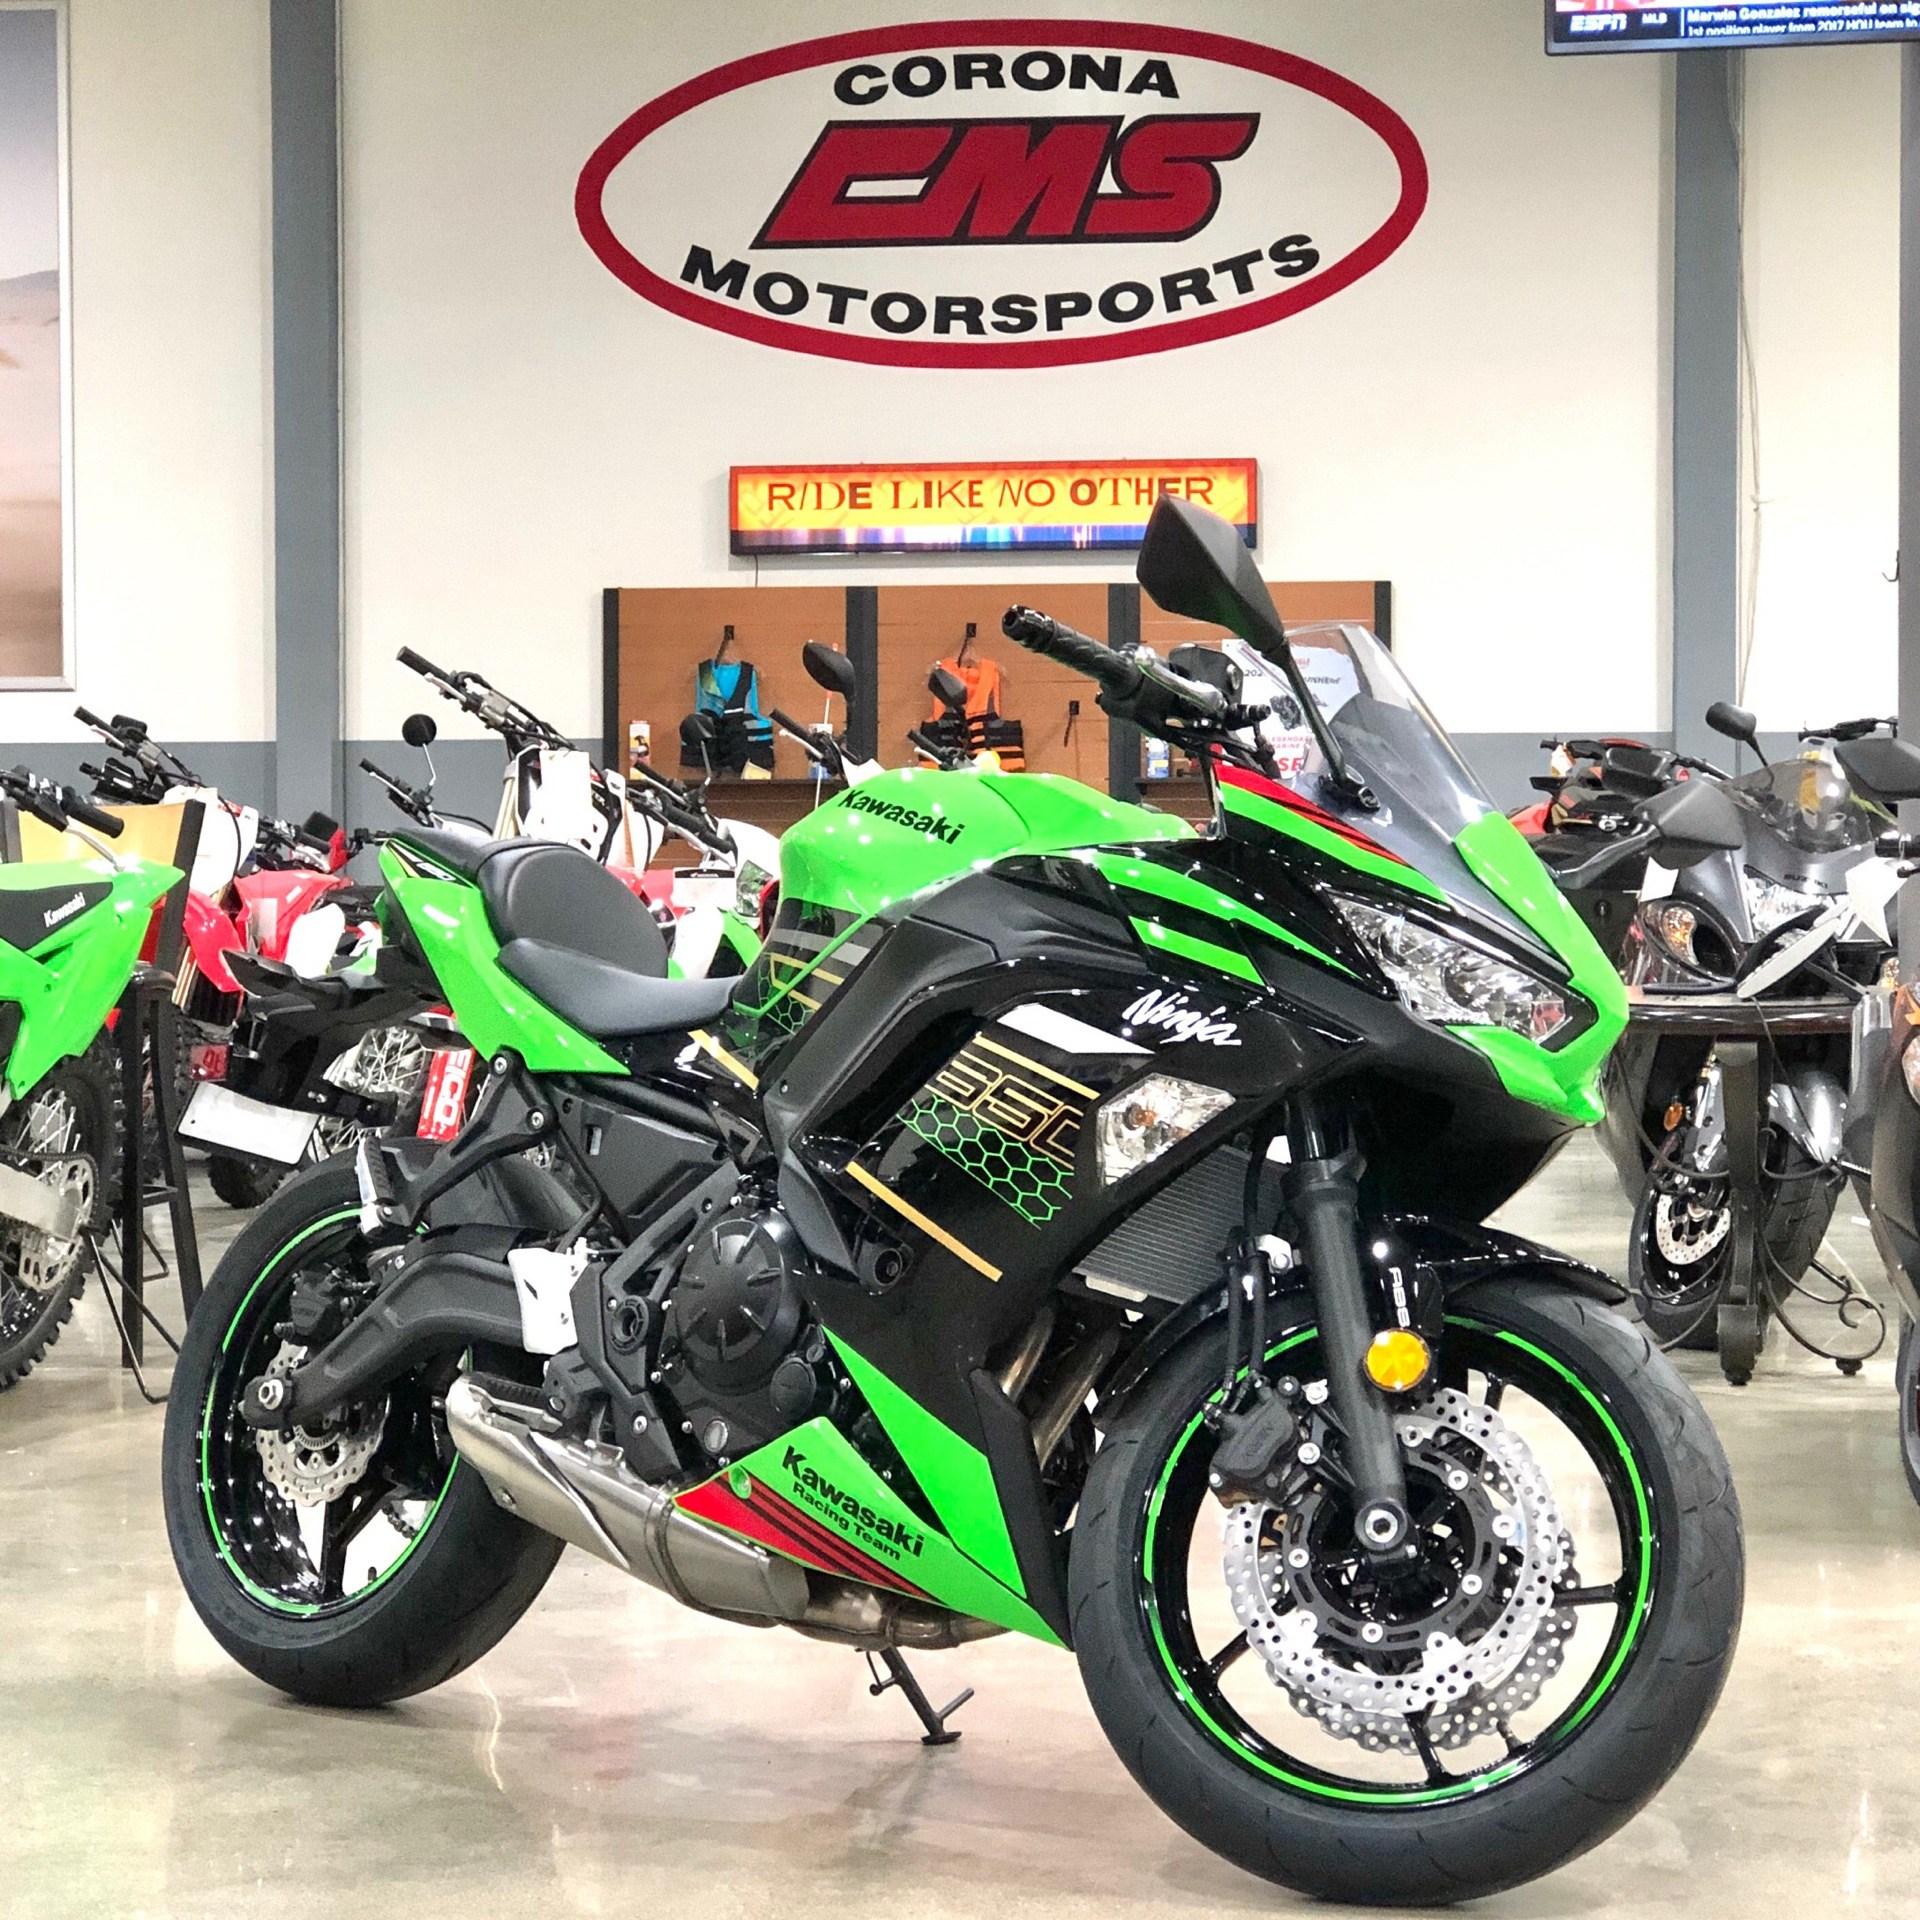 New 2020 Kawasaki Ninja 650 Abs Krt Edition Lime Green Ebony Motorcycles In Corona Ca N A